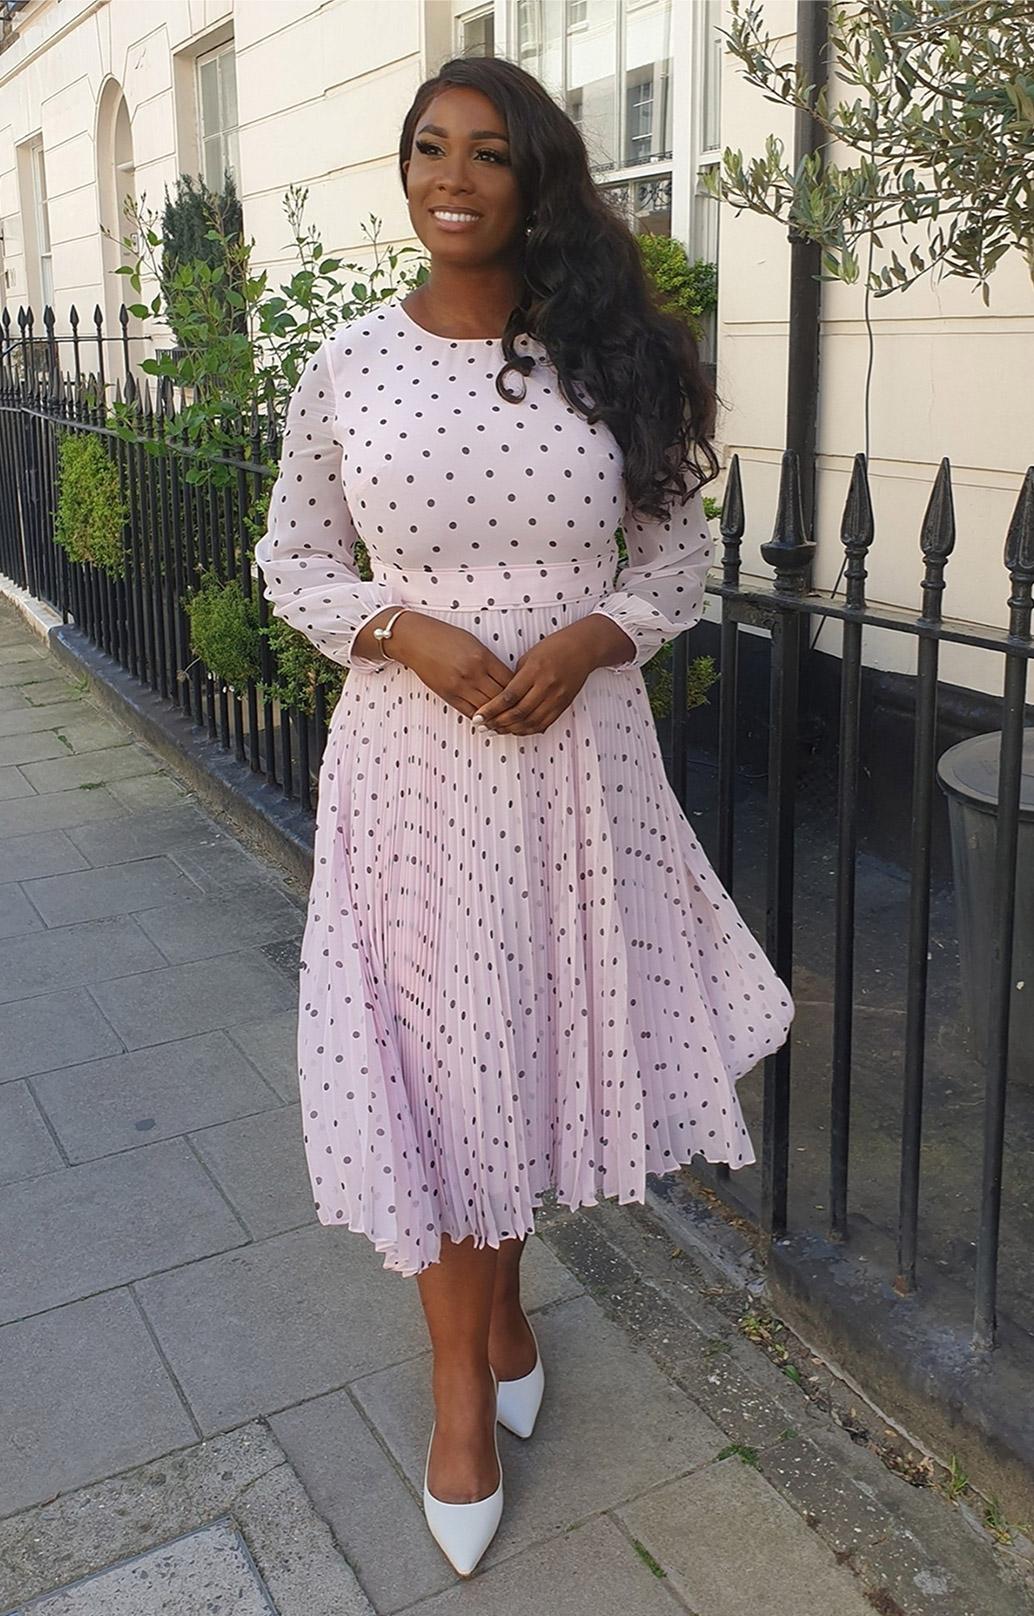 Fashion blogger @woman_ofelegance photographed at a cafe wearing Hobbs' Selena pink polka dot dress.